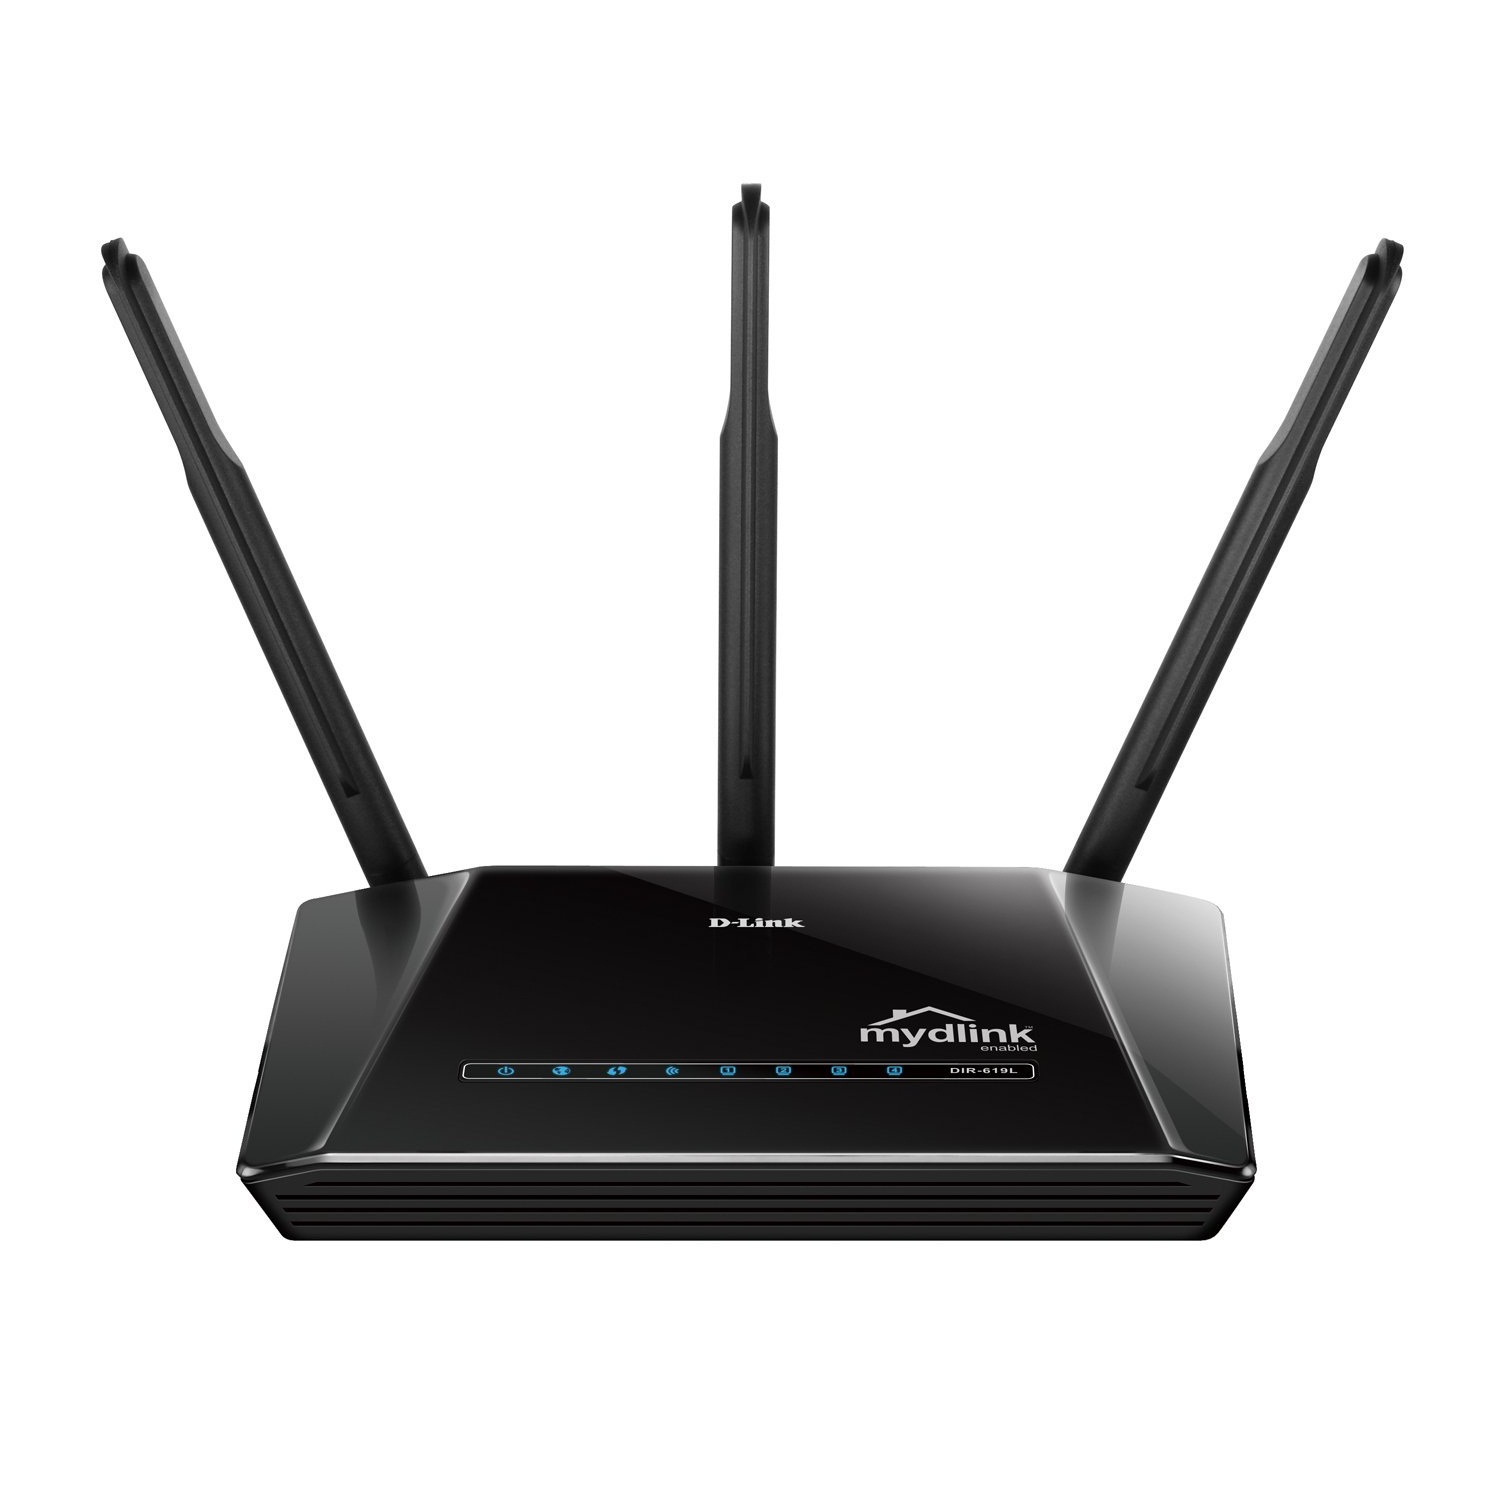 Bộ phát wifi Dlink DIR-619L 300Mbps